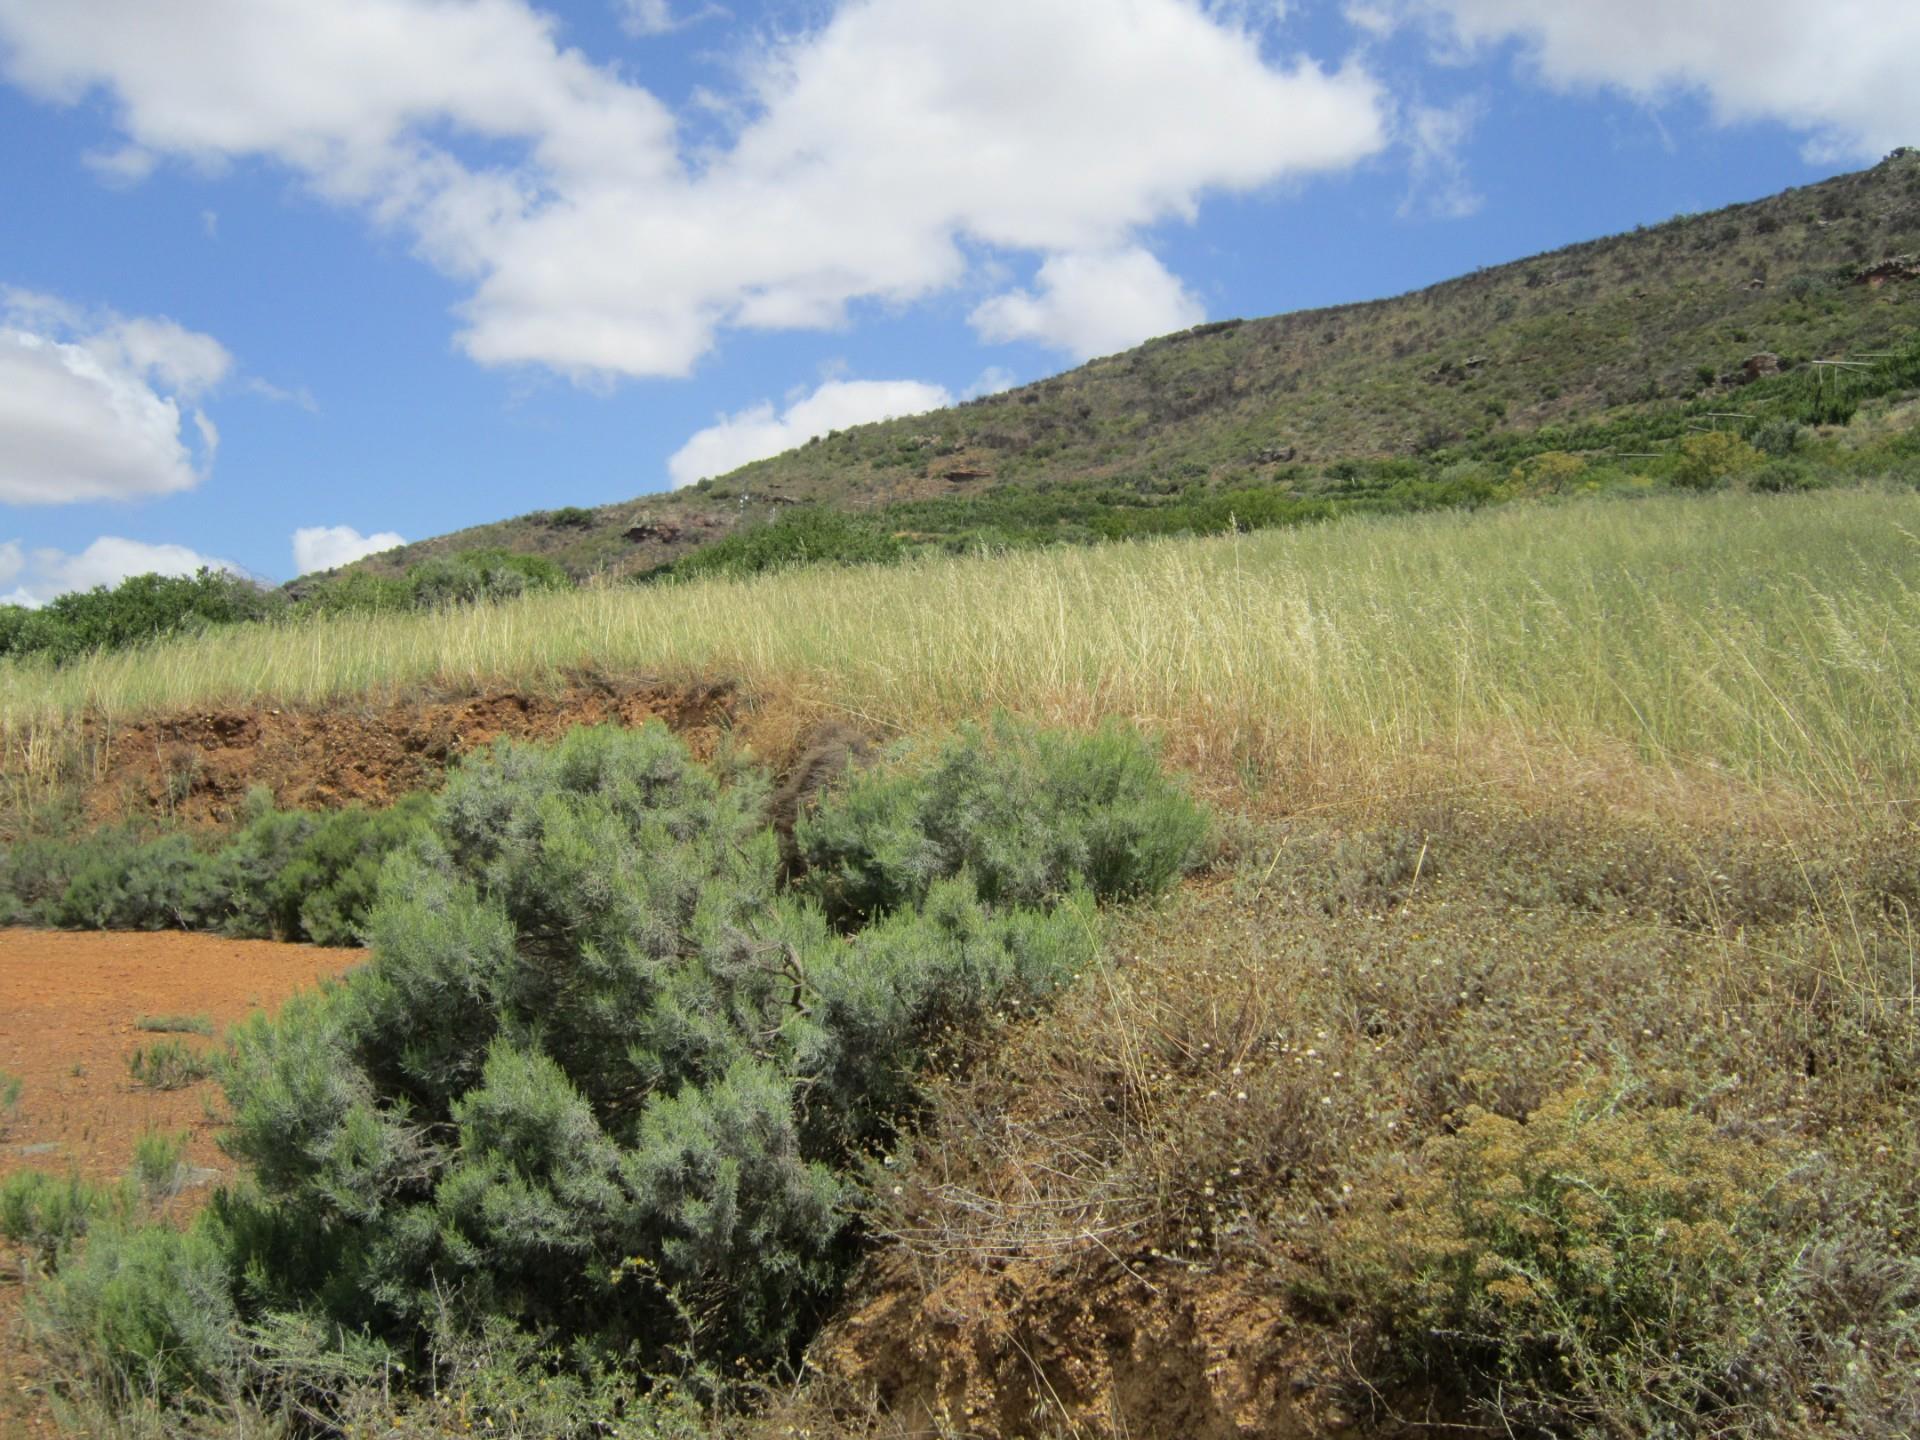 Vacant Land / Plot in Riebeek Kasteel For Sale